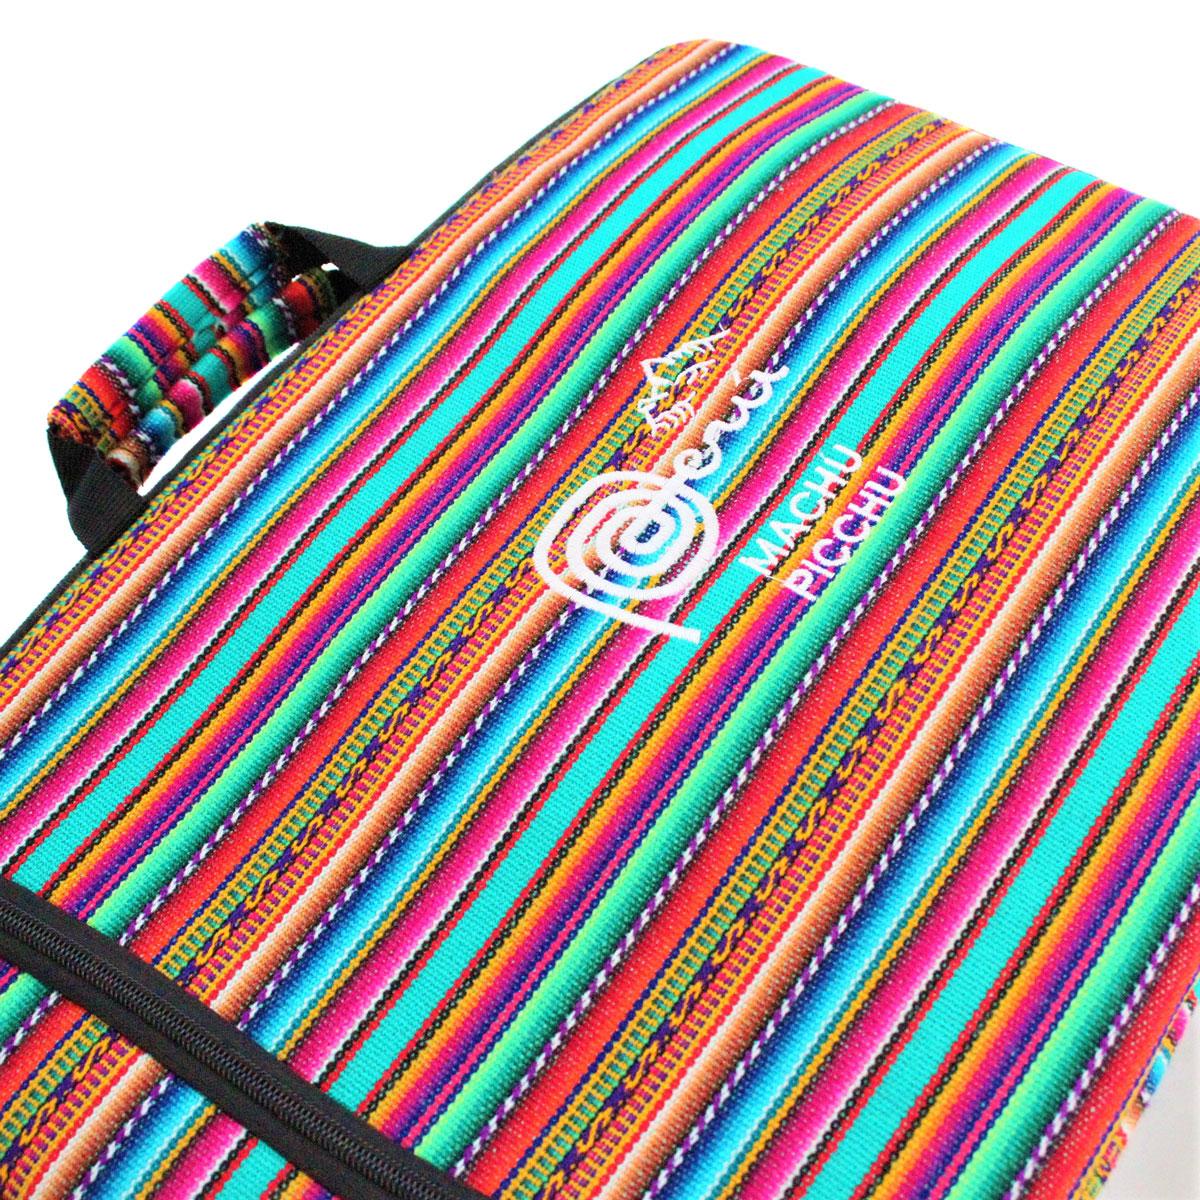 Inka-Products-Housse Ordinateur Portable-Tissu Péruvien Machu Picchu-2